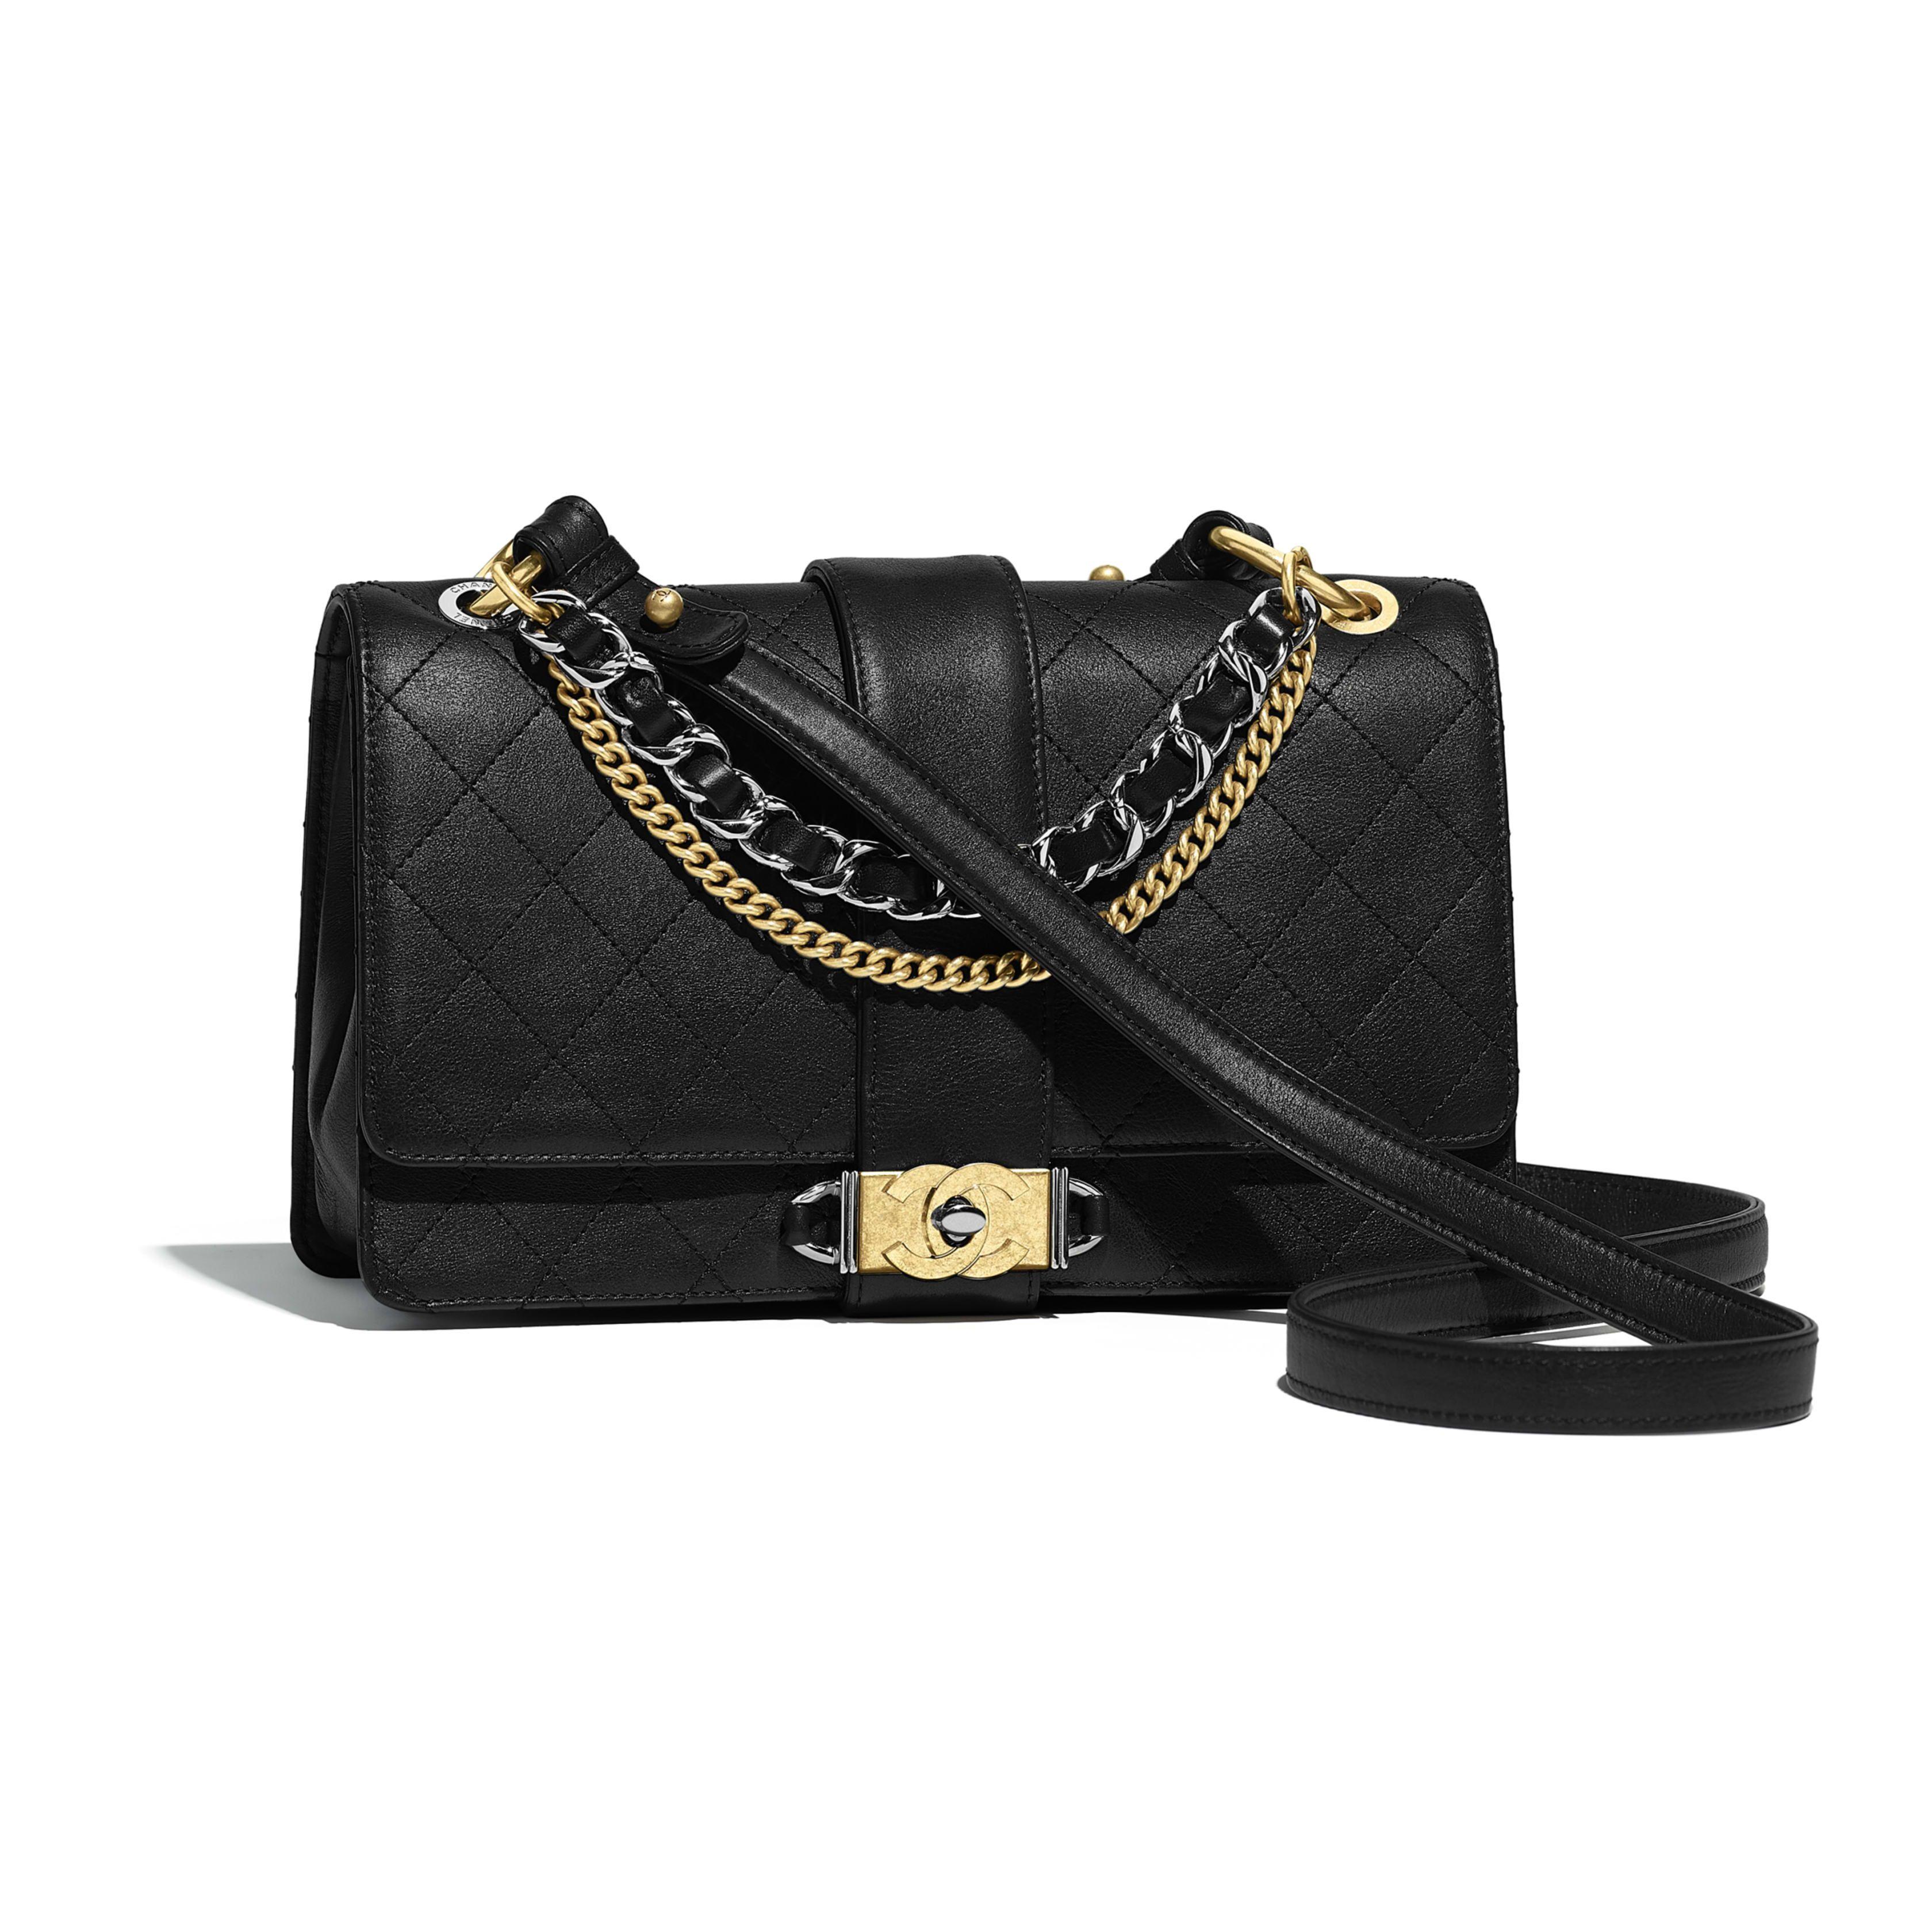 f933900988 Flap Bag - Black - Calfskin